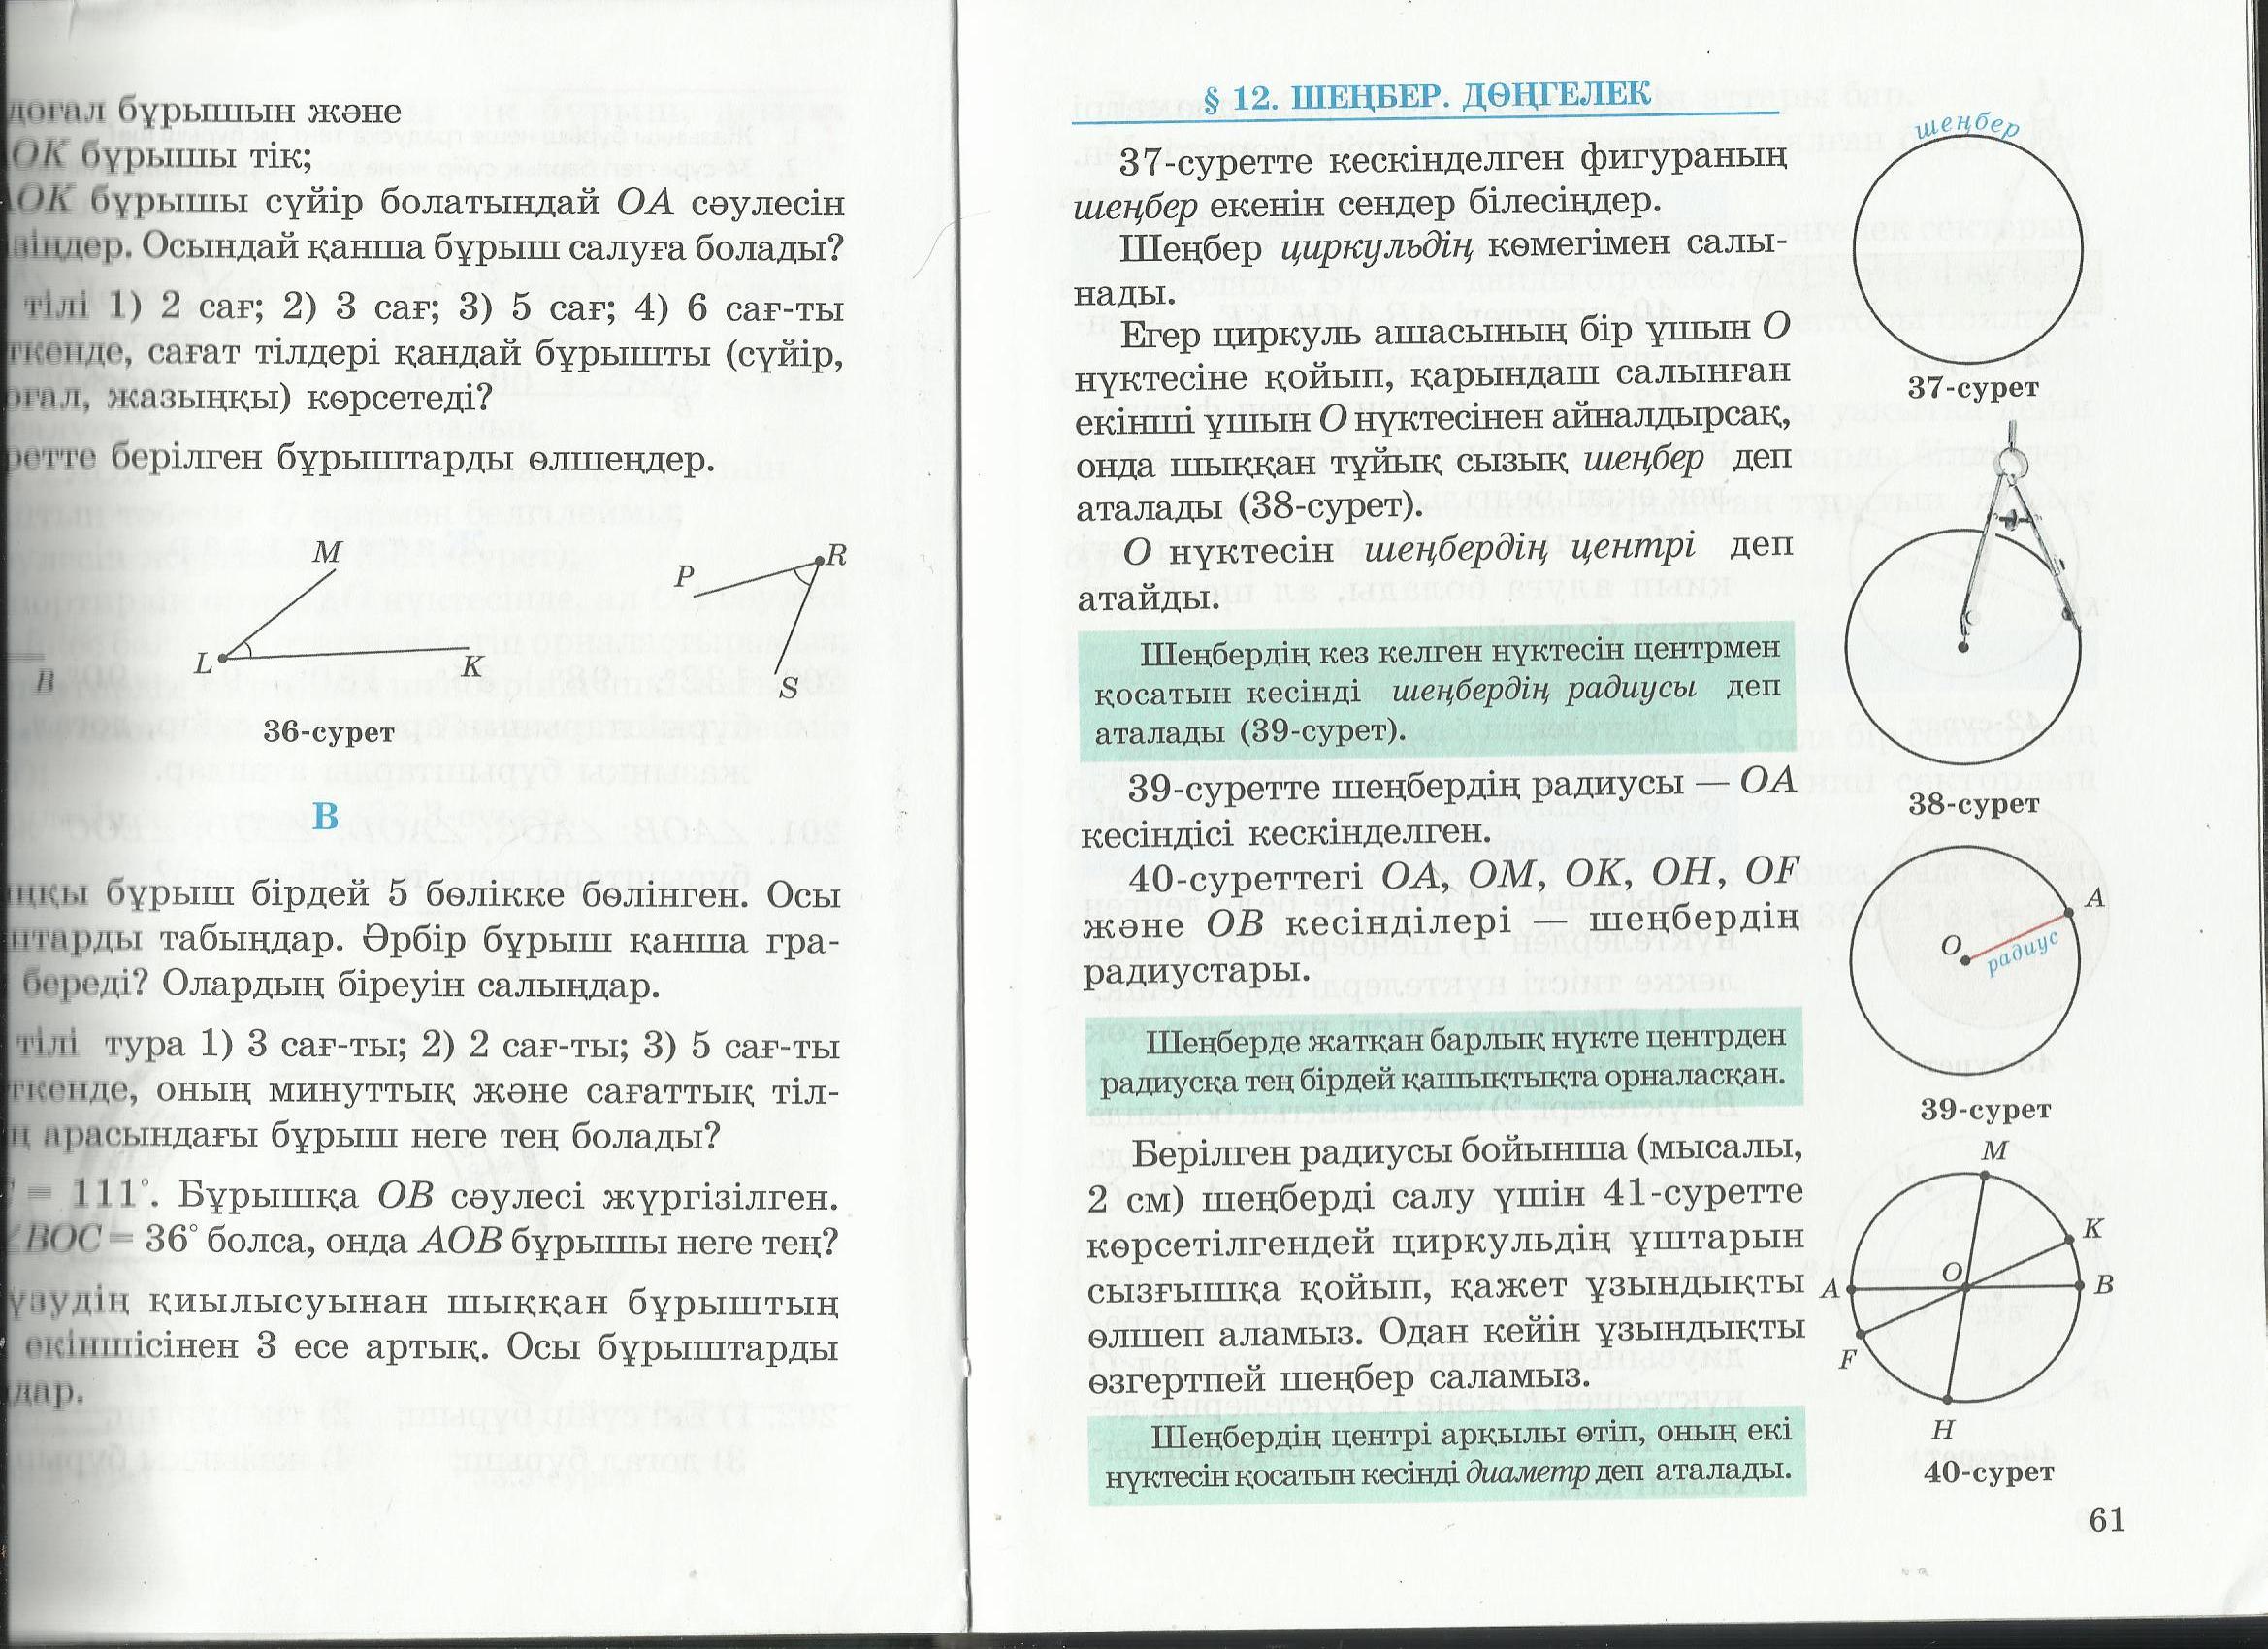 C:\Documents and Settings\Admin\Рабочий стол\Новая папка (5)\Математика\Изображение 076.jpg